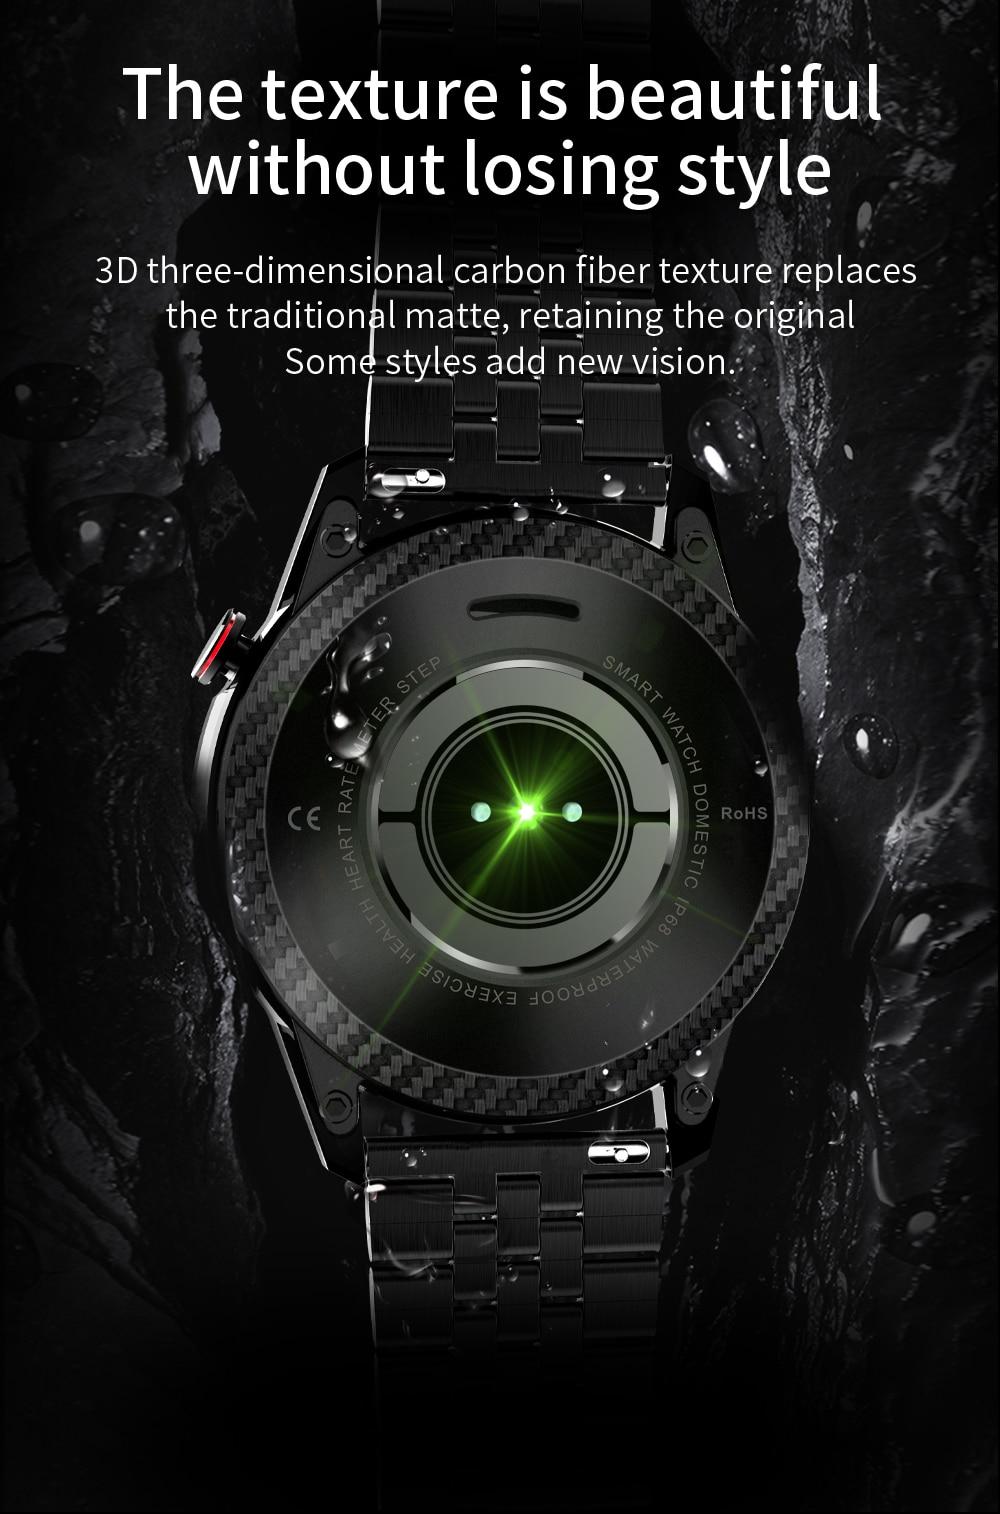 H4277086de5fd4c18bc595787694f52b3b New Smart Watch Men Bluetooth Call TK2-8 IP68 Waterproof Heart Rate Blood Pressure SmartWatch Fitness Tracker Sports Android IOS